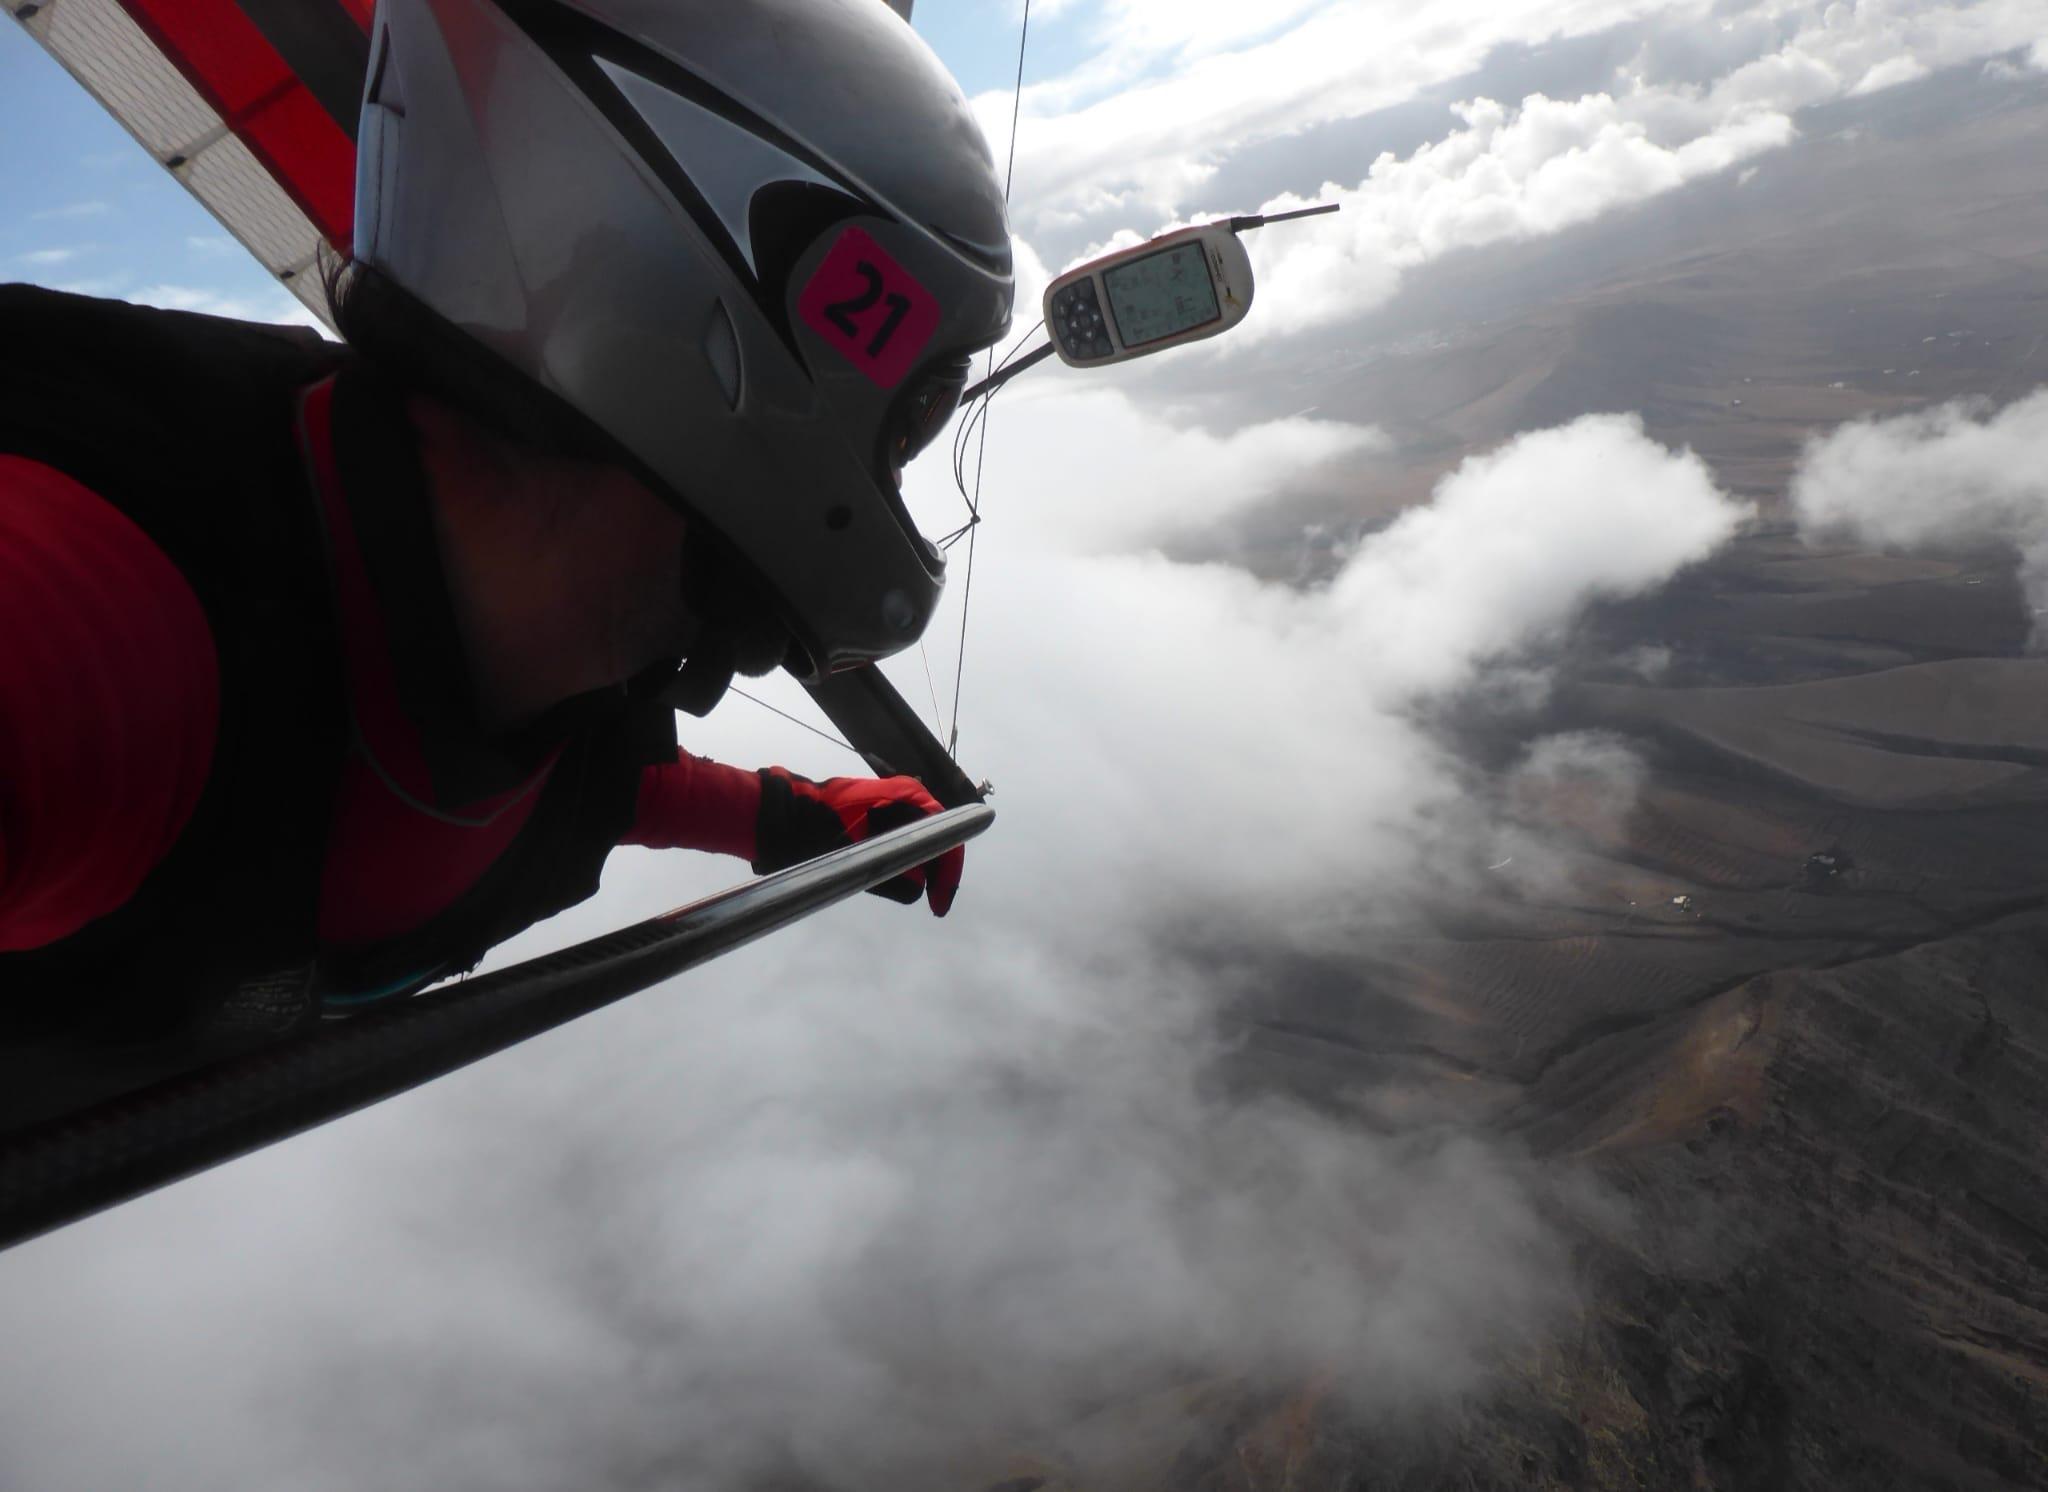 Piloto encima de la nube en Famara